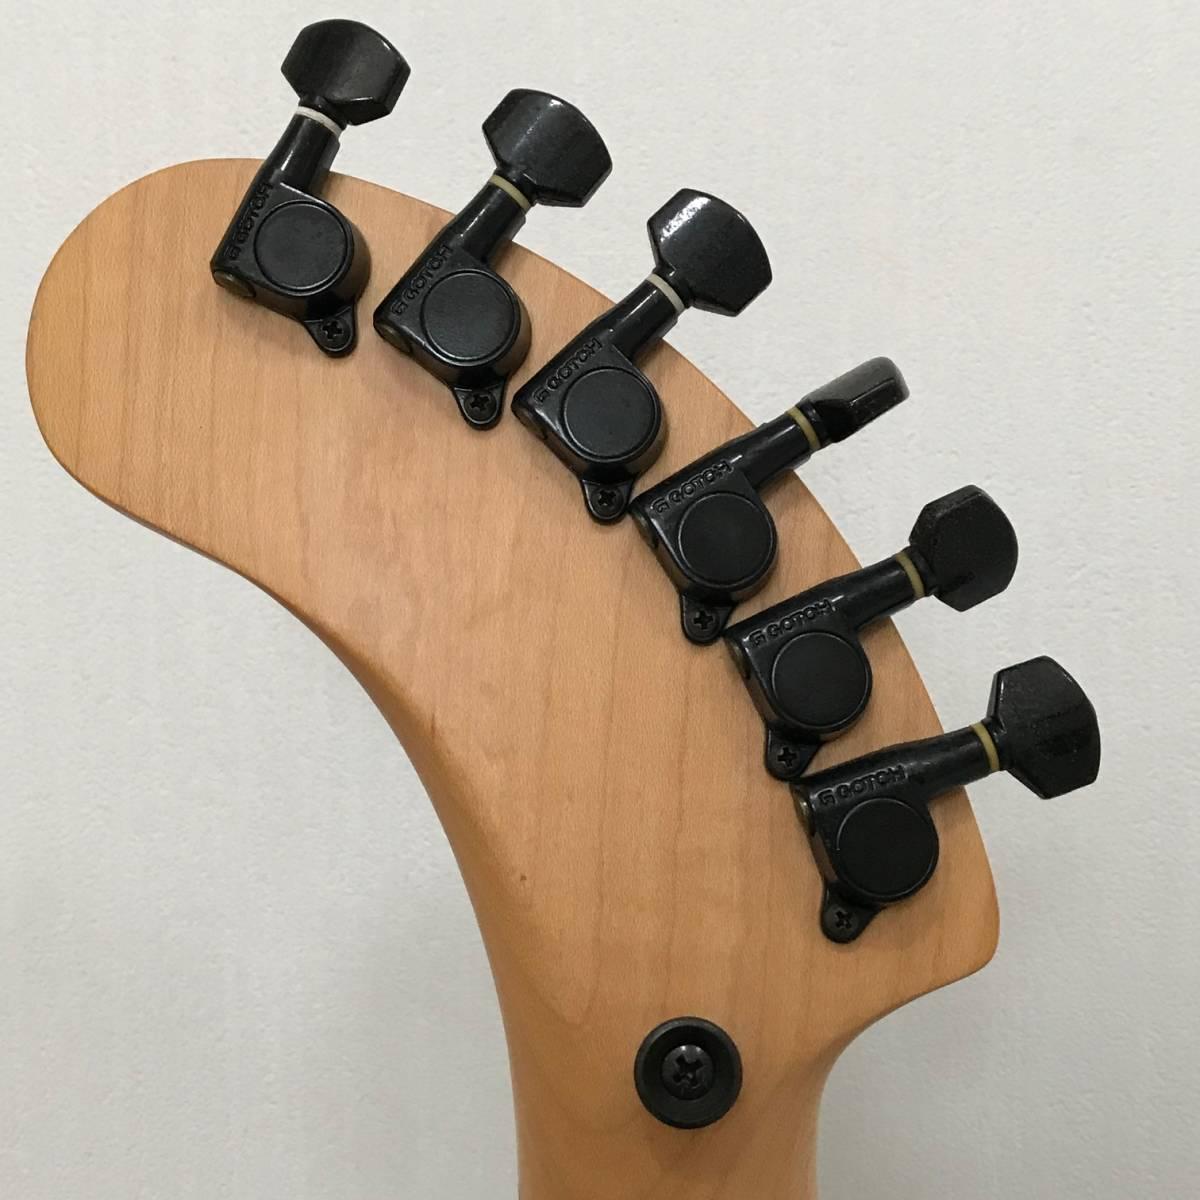 ZO-3 芸達者 ディストーション アンプ内臓 GOTOHペグ ギター ブラックメタリック ジャンク FERNANDES_画像8